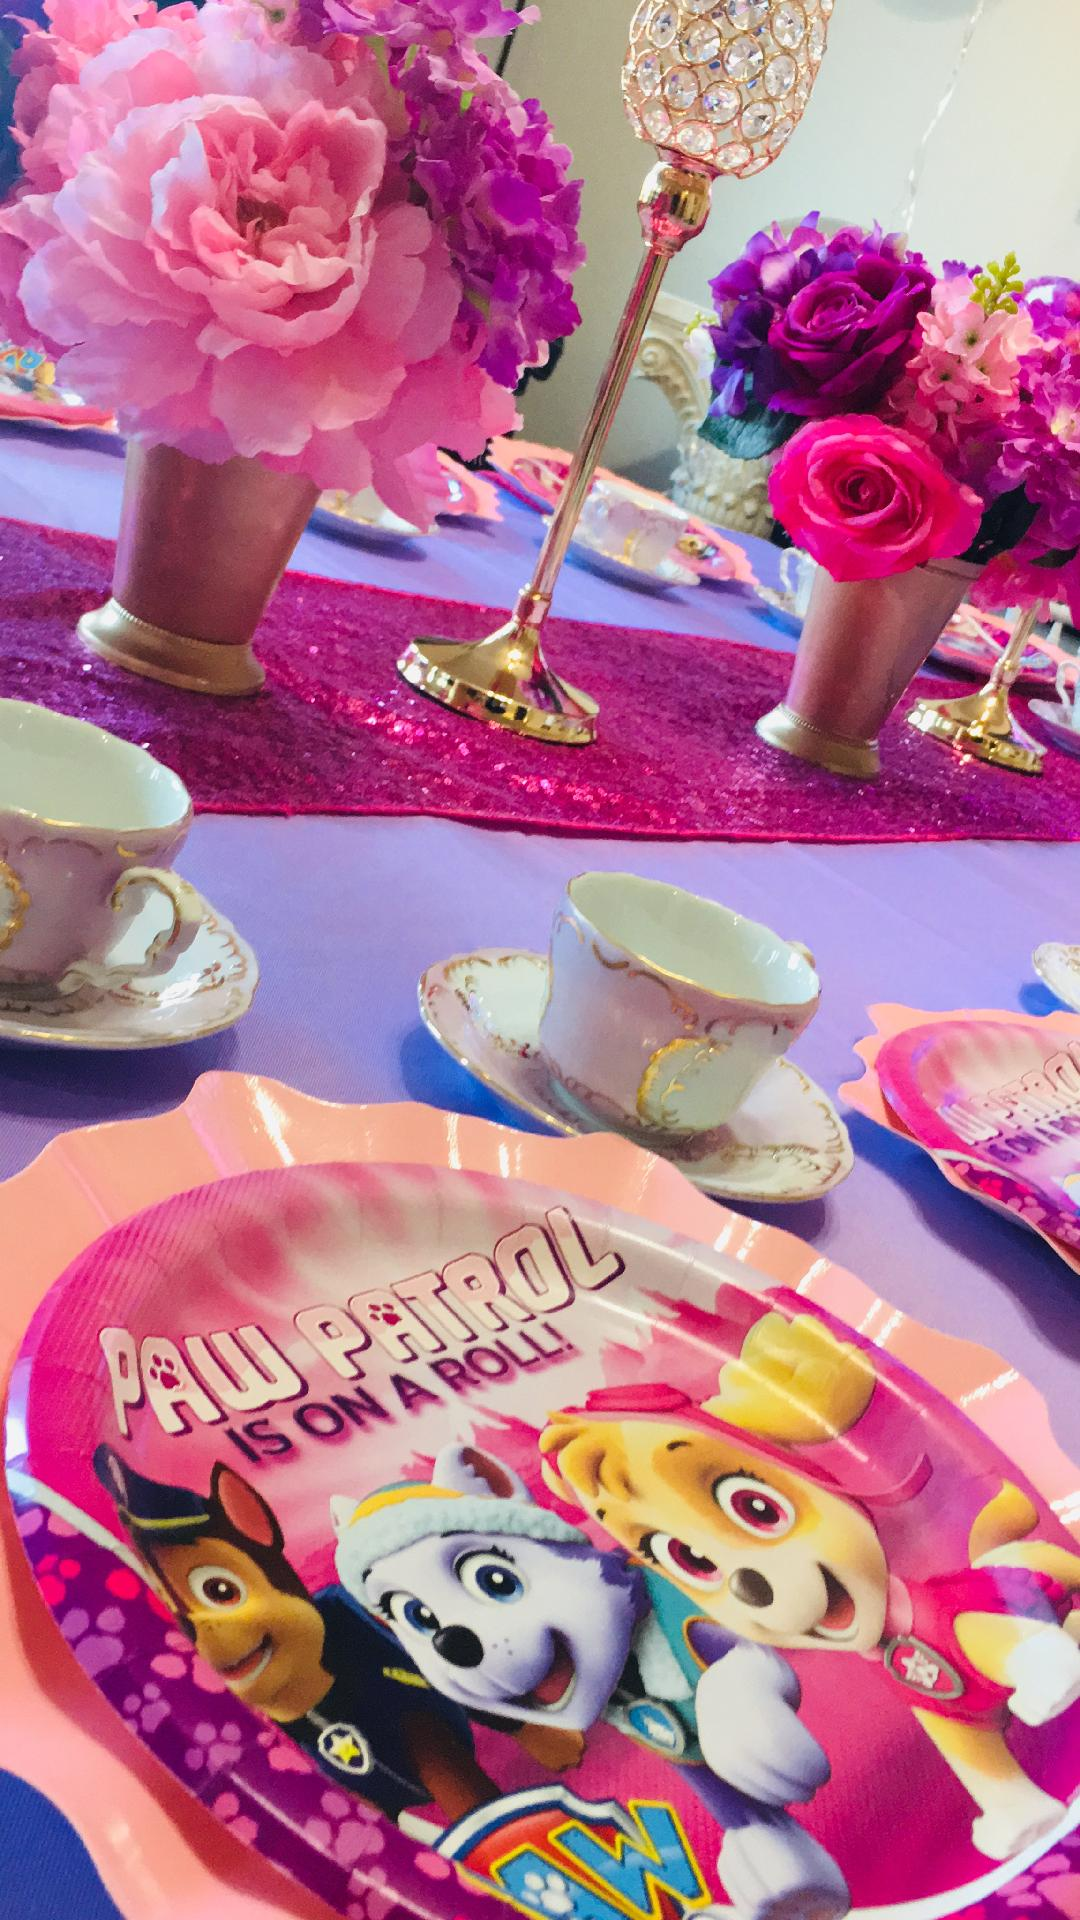 pawpatrol party houston www.tlparties.com 2.jpg